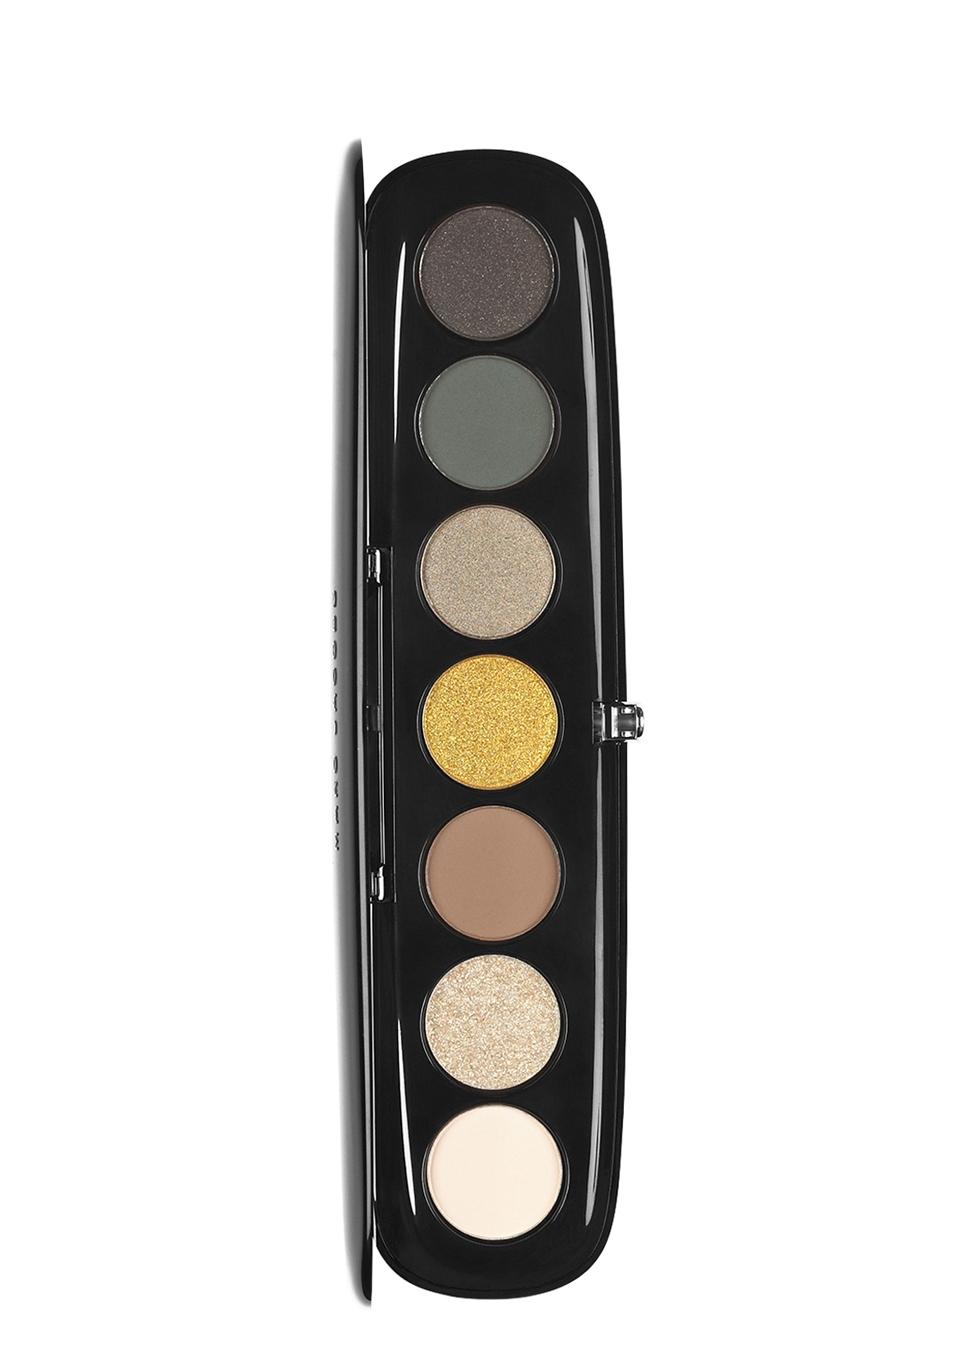 Eye-Conic Multi-Finish Eyeshadow Palette - Edgitorial - MARC JACOBS BEAUTY